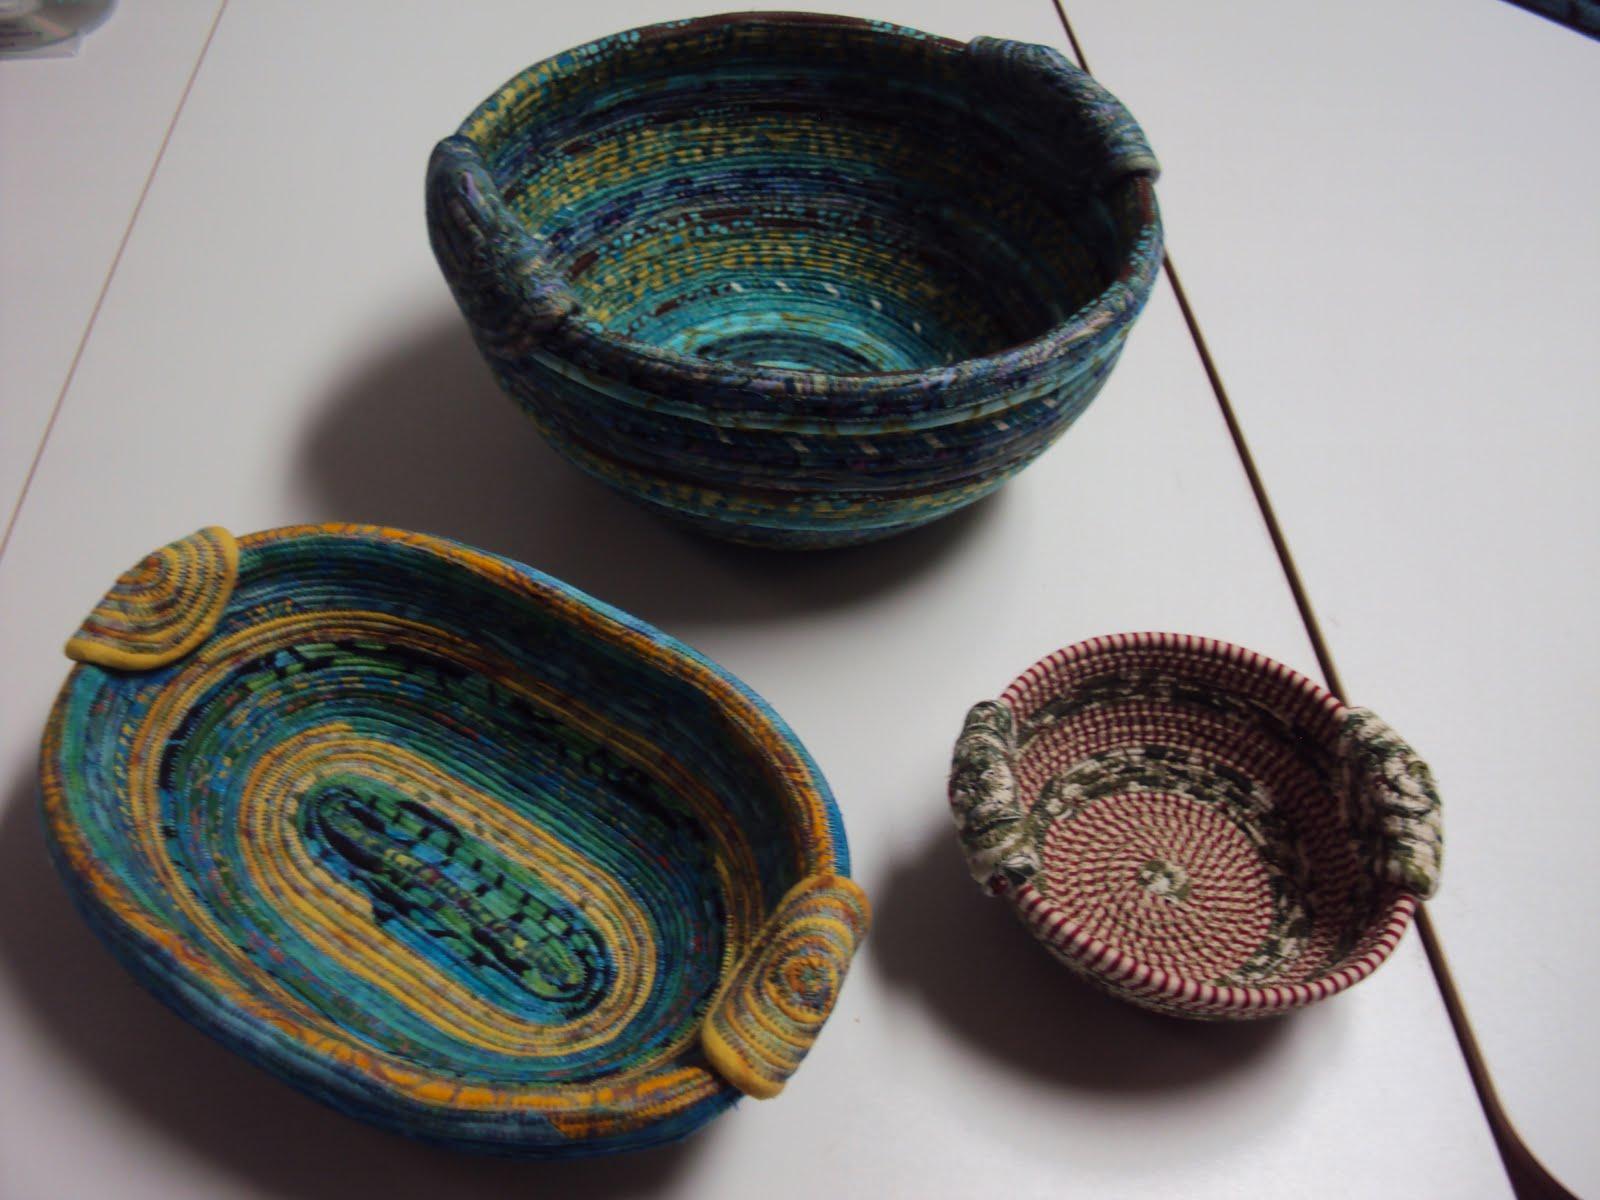 Clothesline Bowls